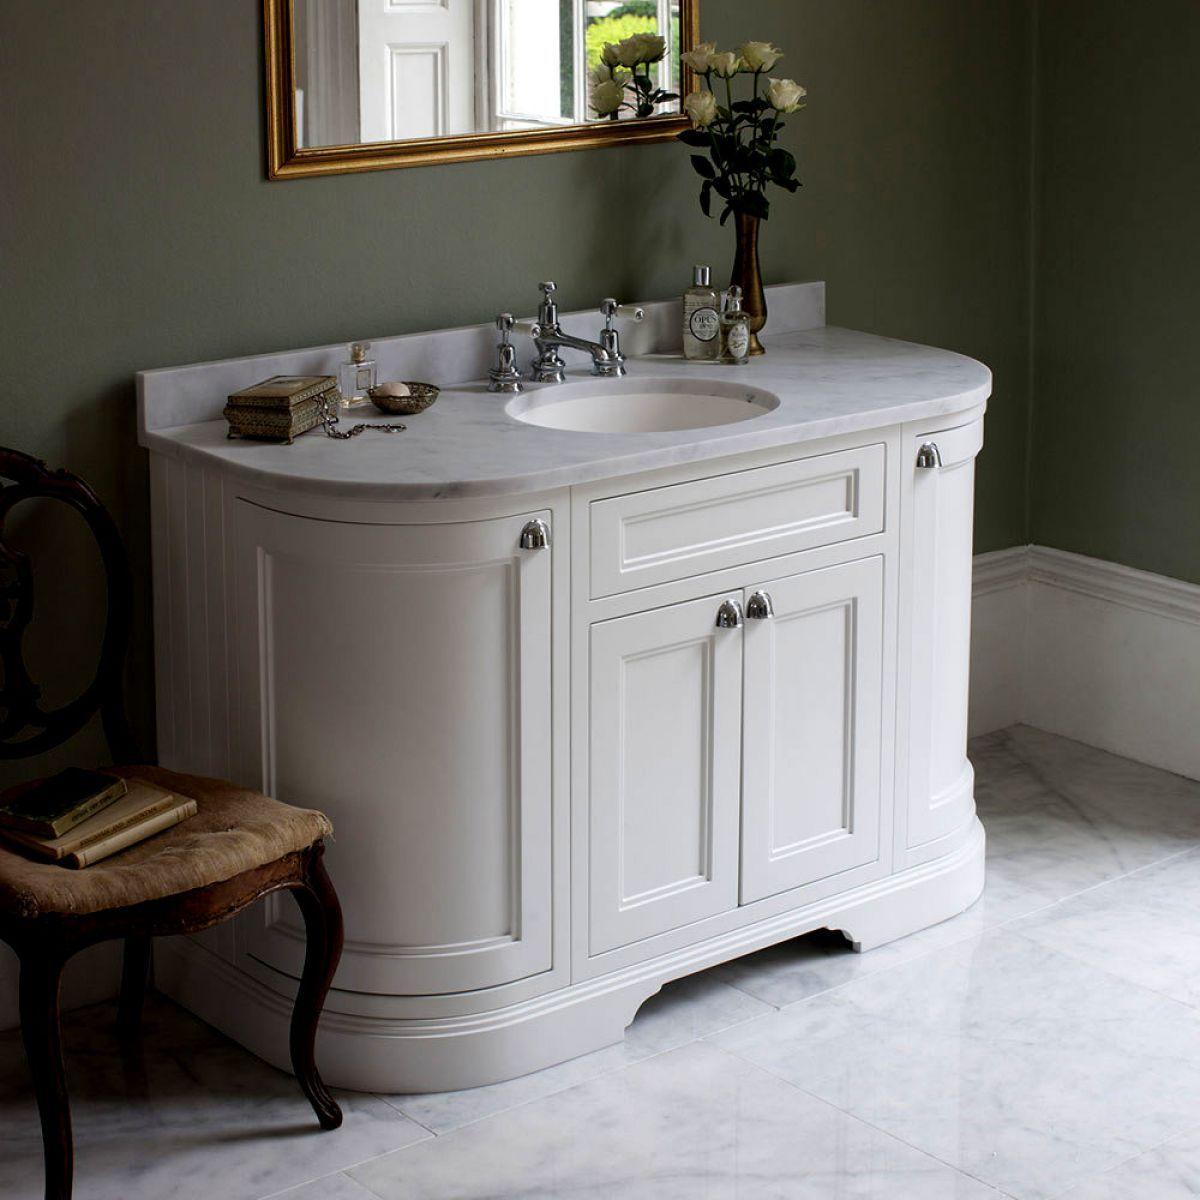 double vanity units for bathrooms. Burlington 134 Curved Vanity Unit with Double Doors  UK Bathrooms